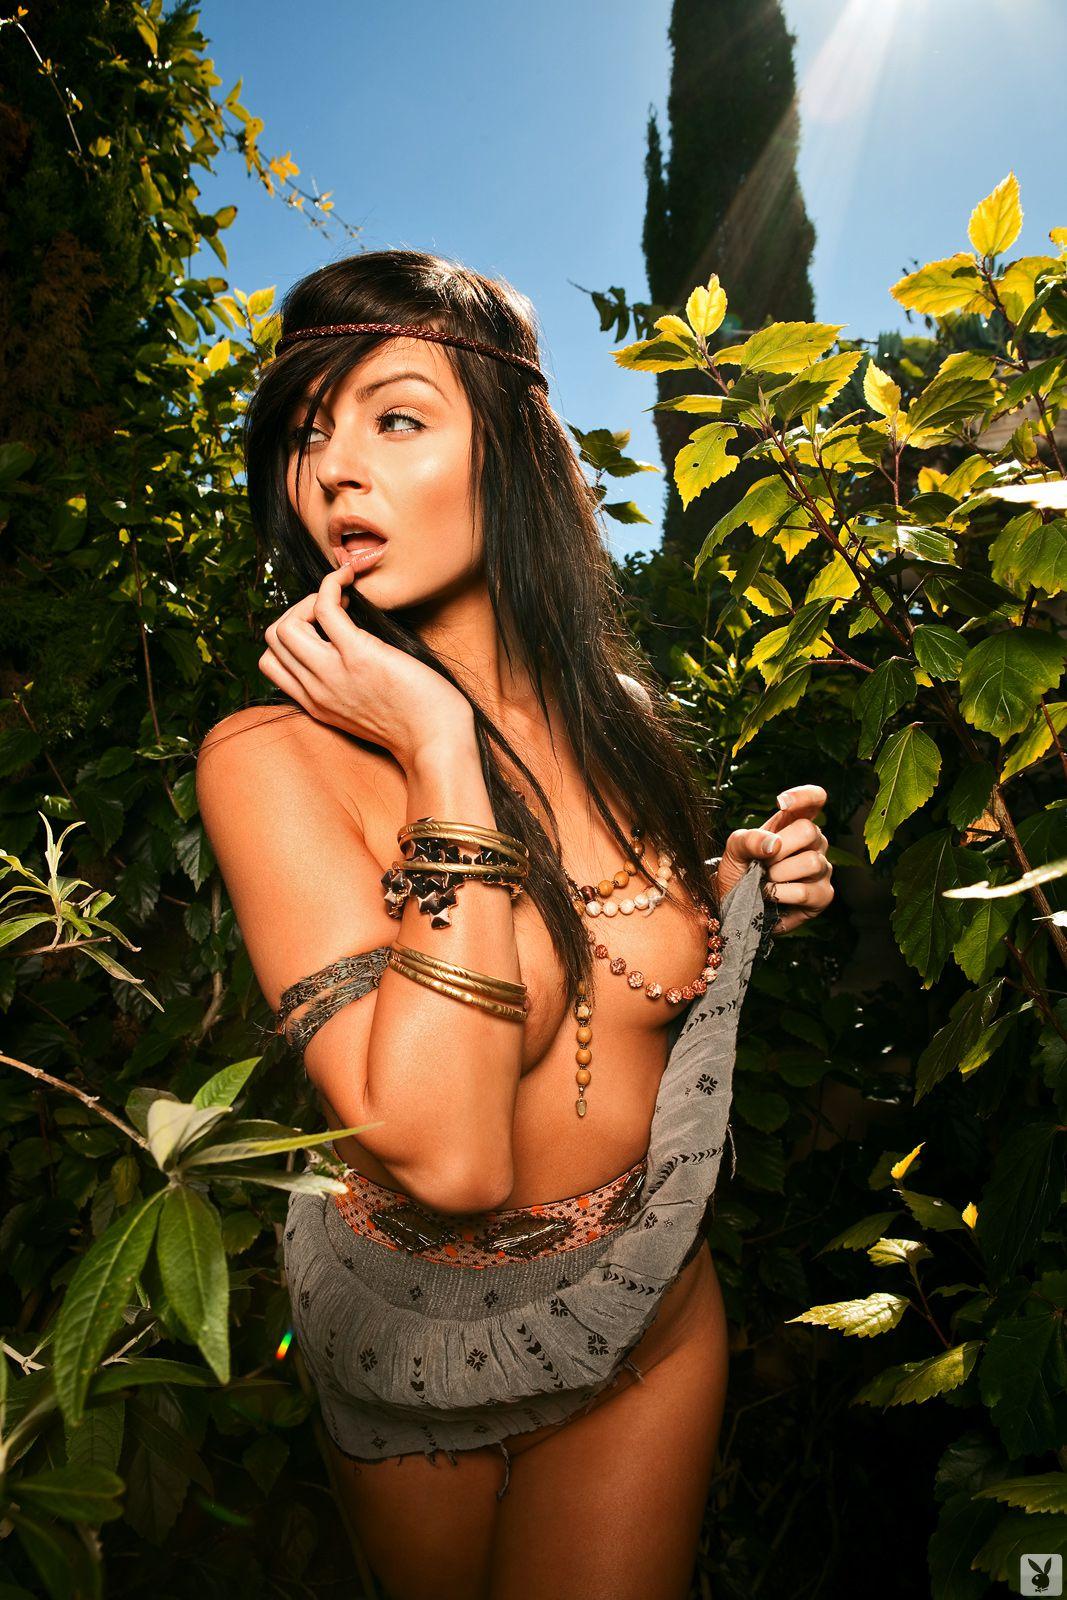 Veronica_LaVery (34)